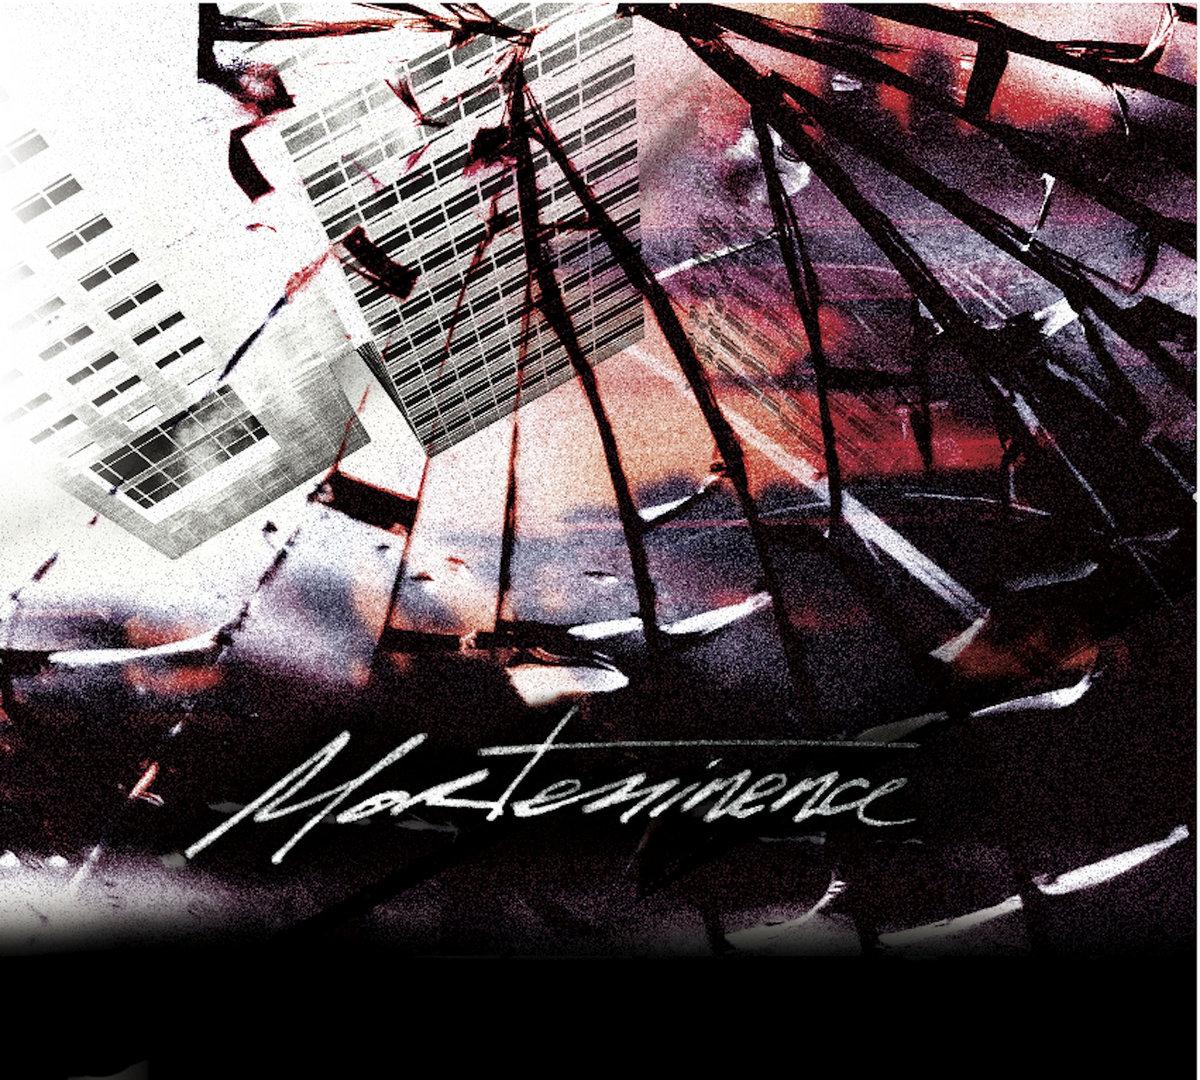 https://morteminence.bandcamp.com/album/morteminence